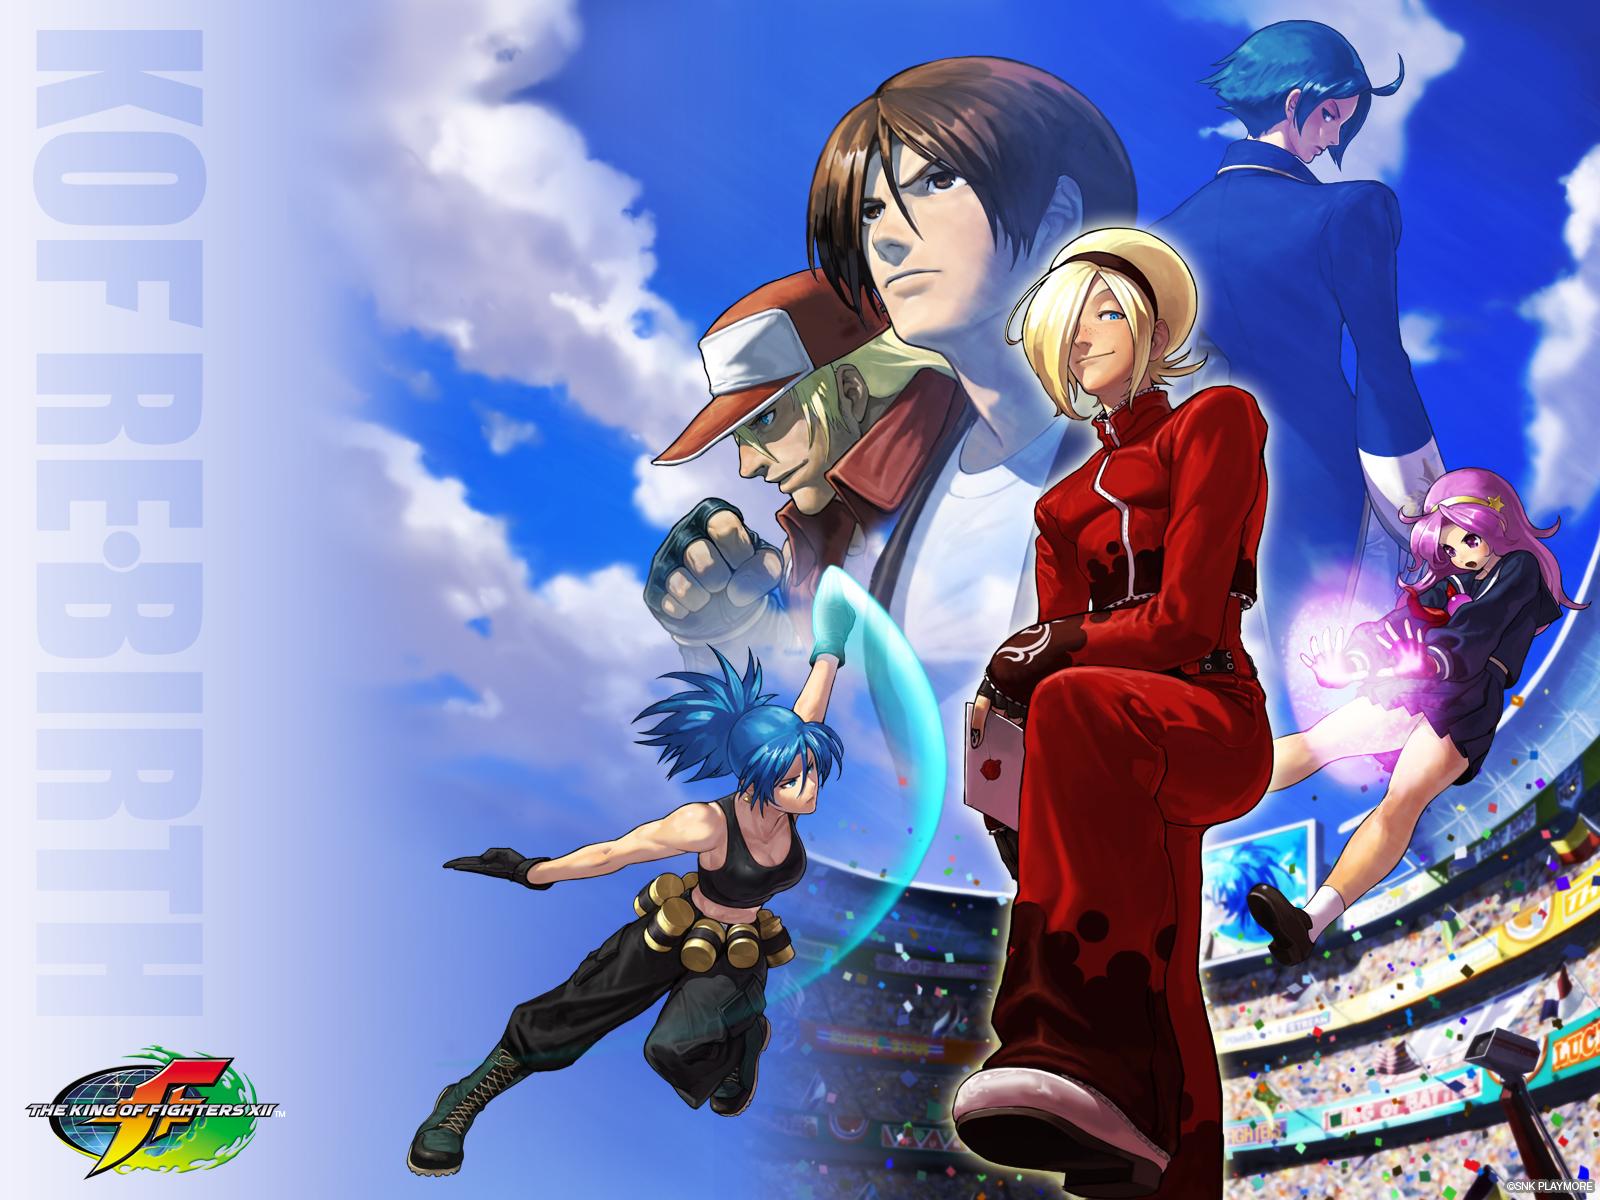 The King Of Fighters Wallpaper Zerochan Anime Image Board